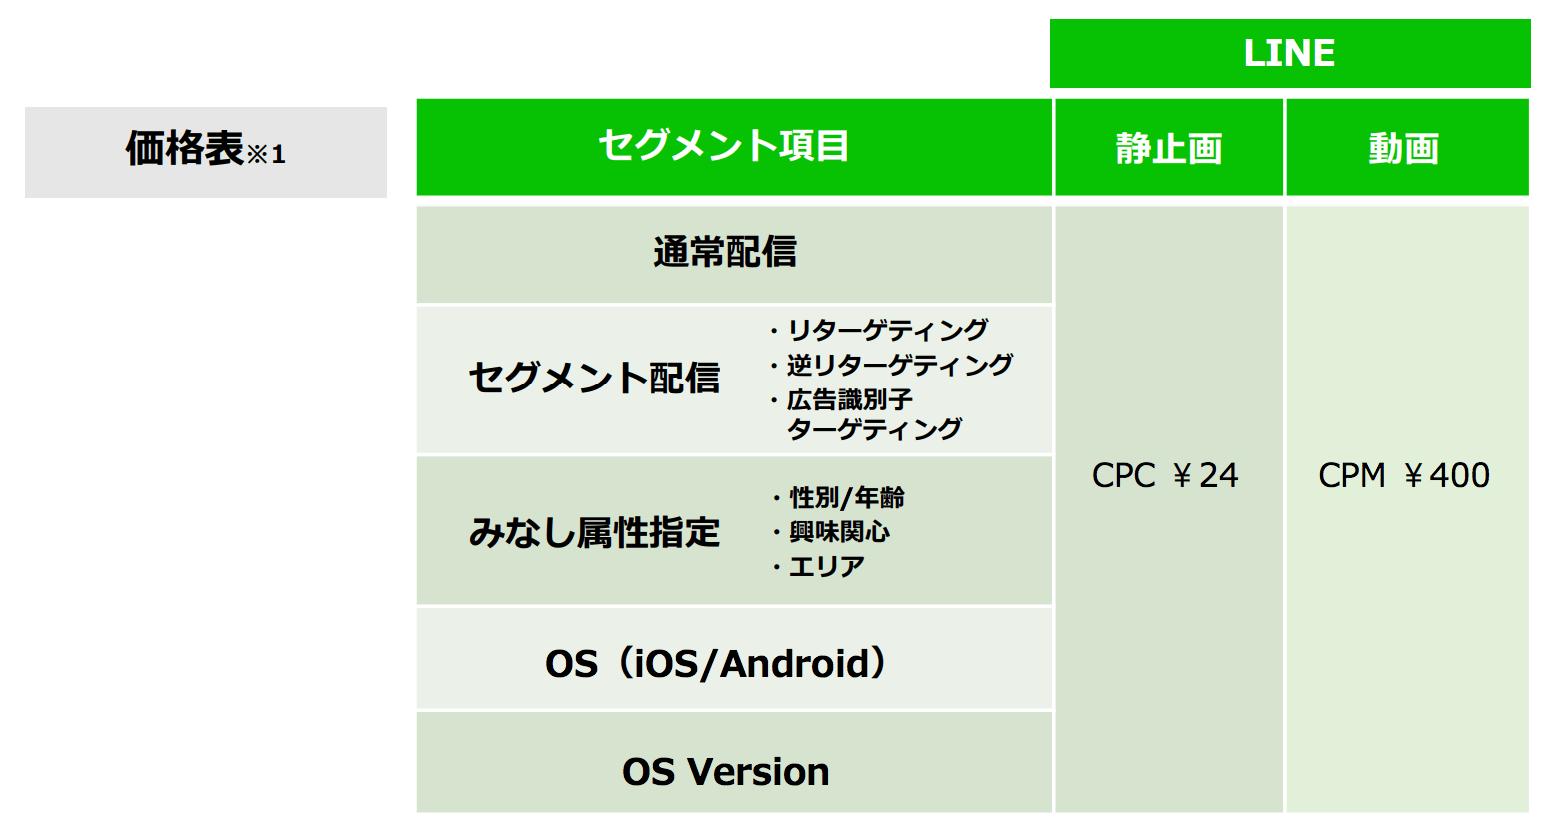 LINE Ads Platform 料金